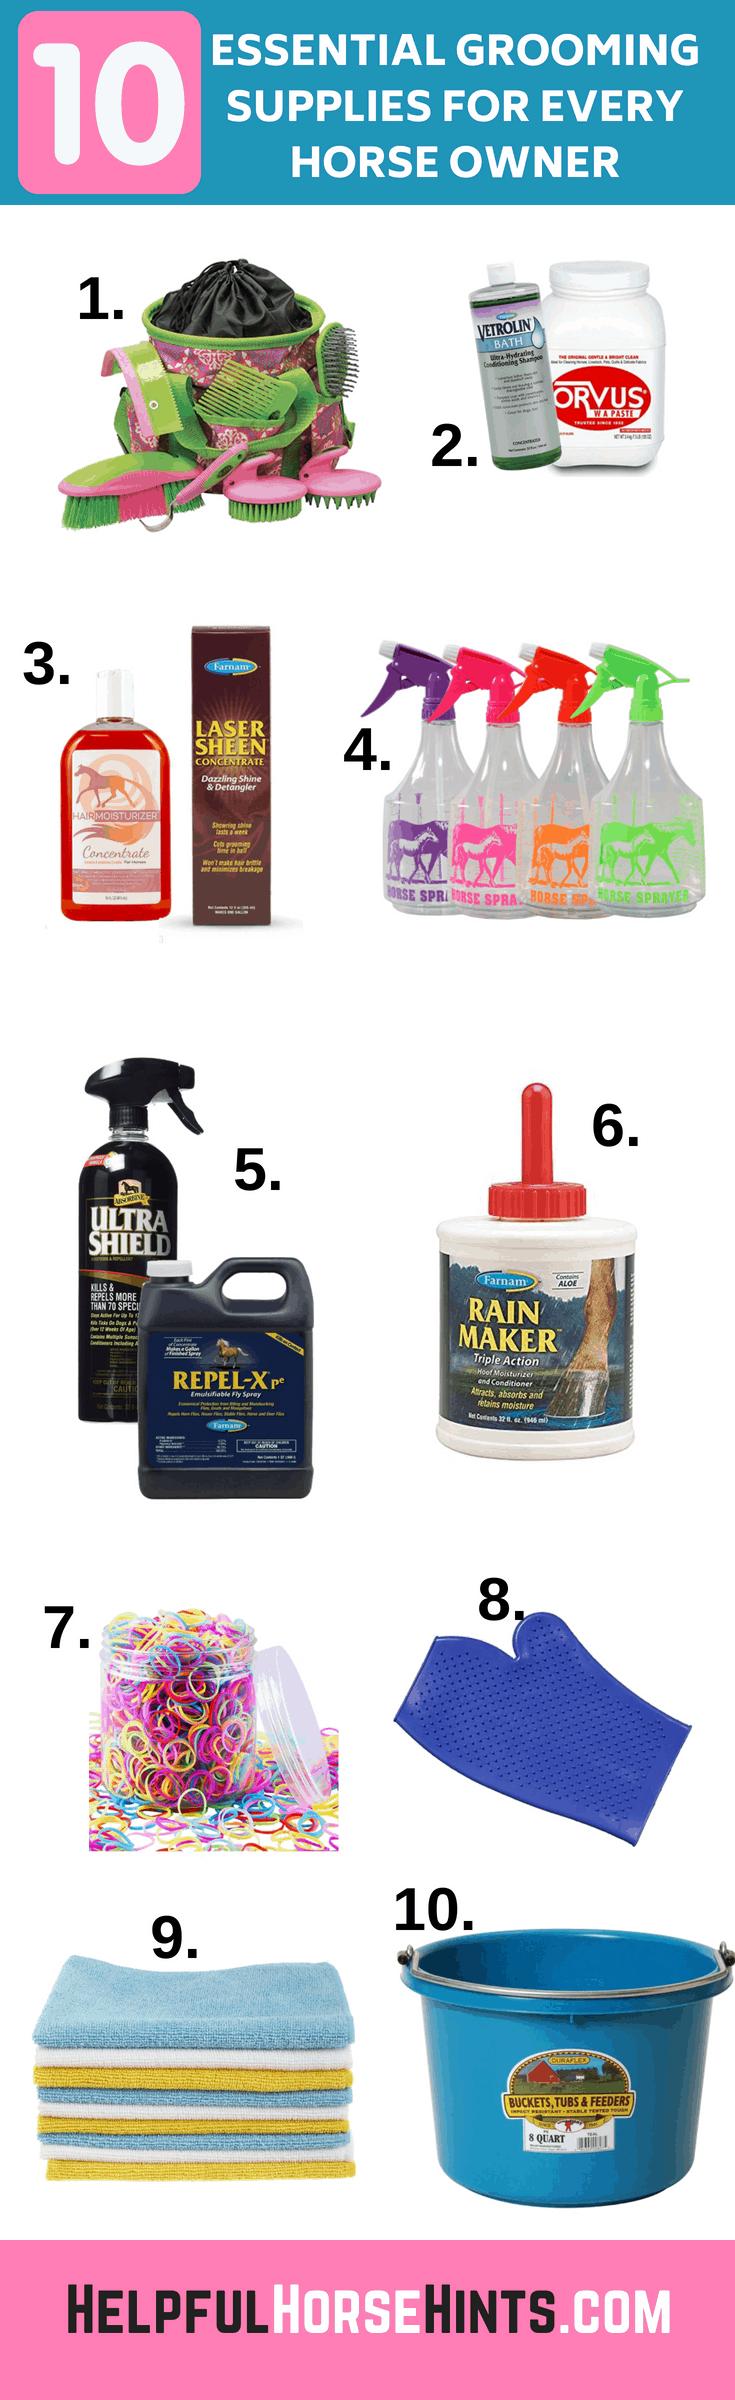 10 Essential Horse Grooming Supplies